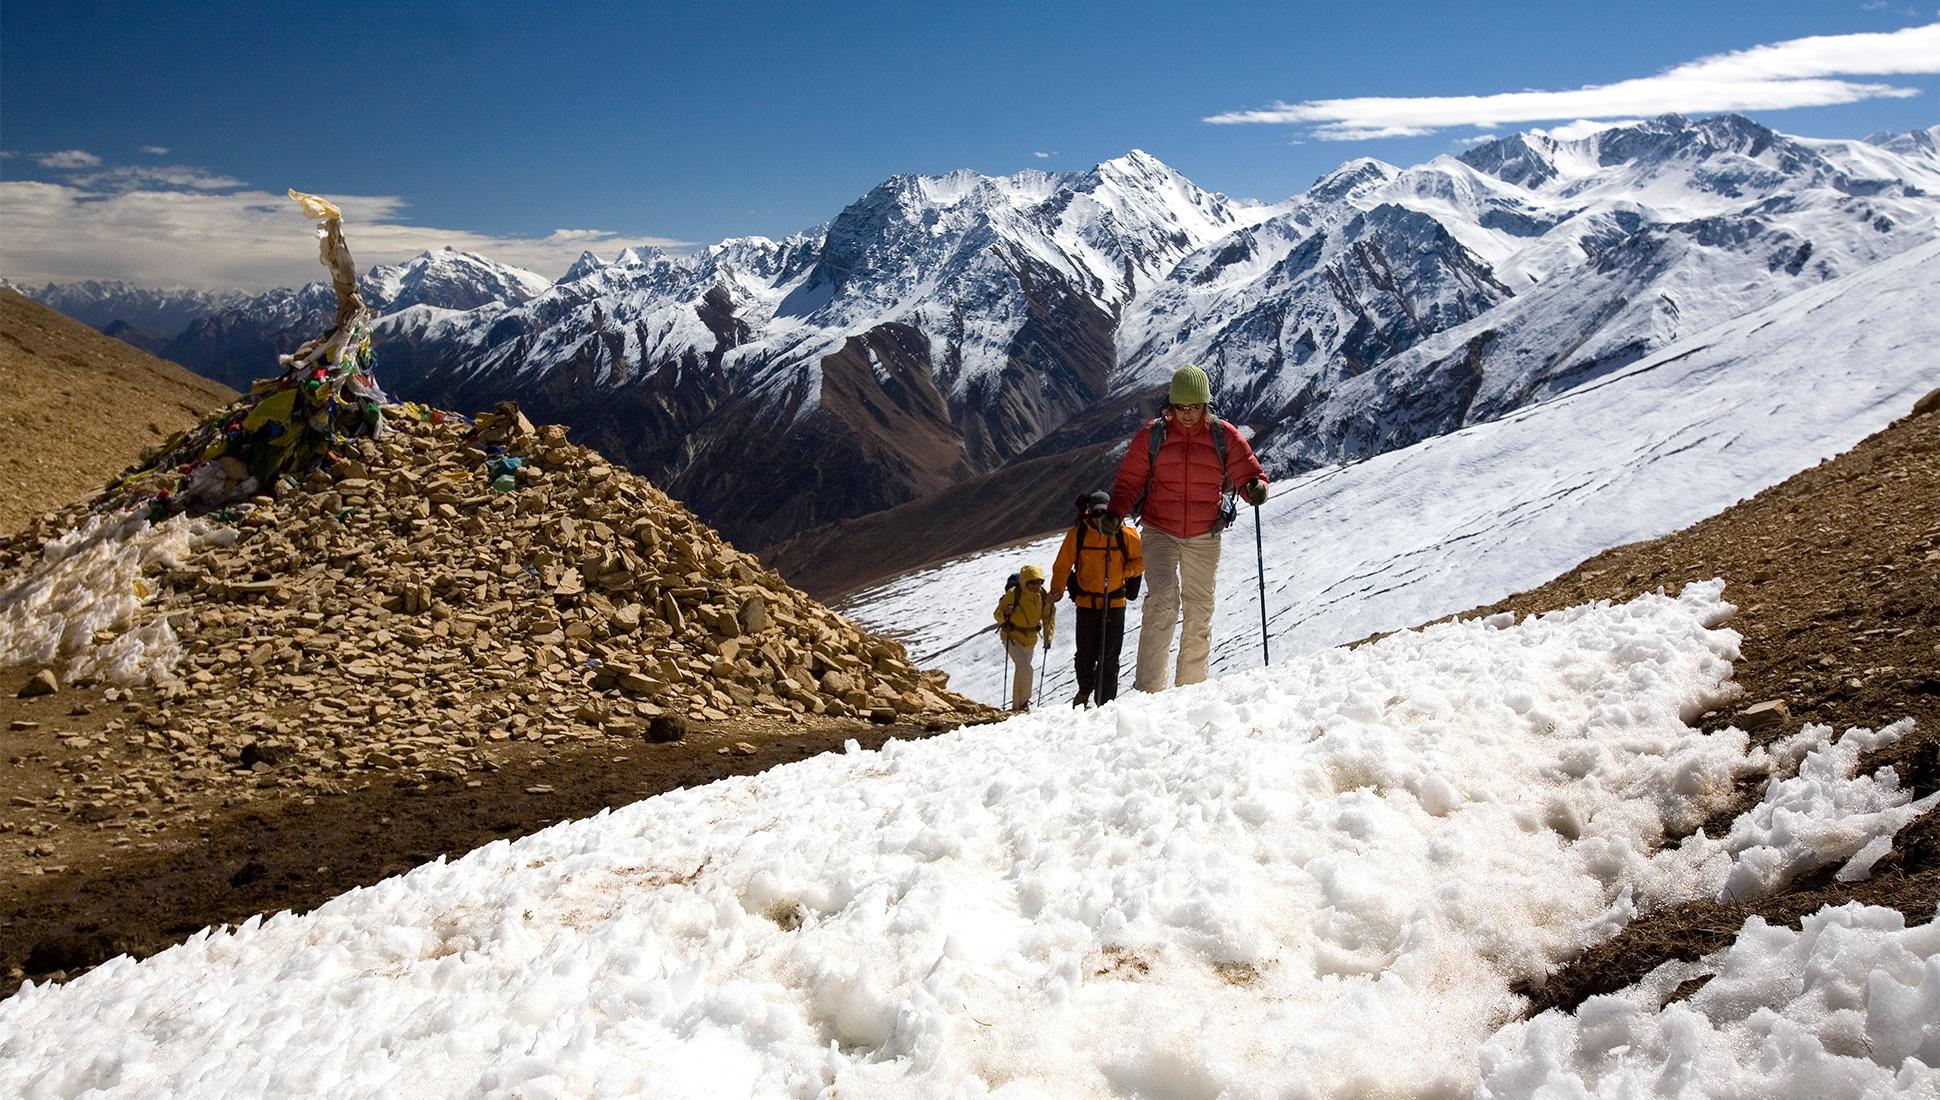 AdventureWeek - Rebound Nepal on the Great Himalaya Trails